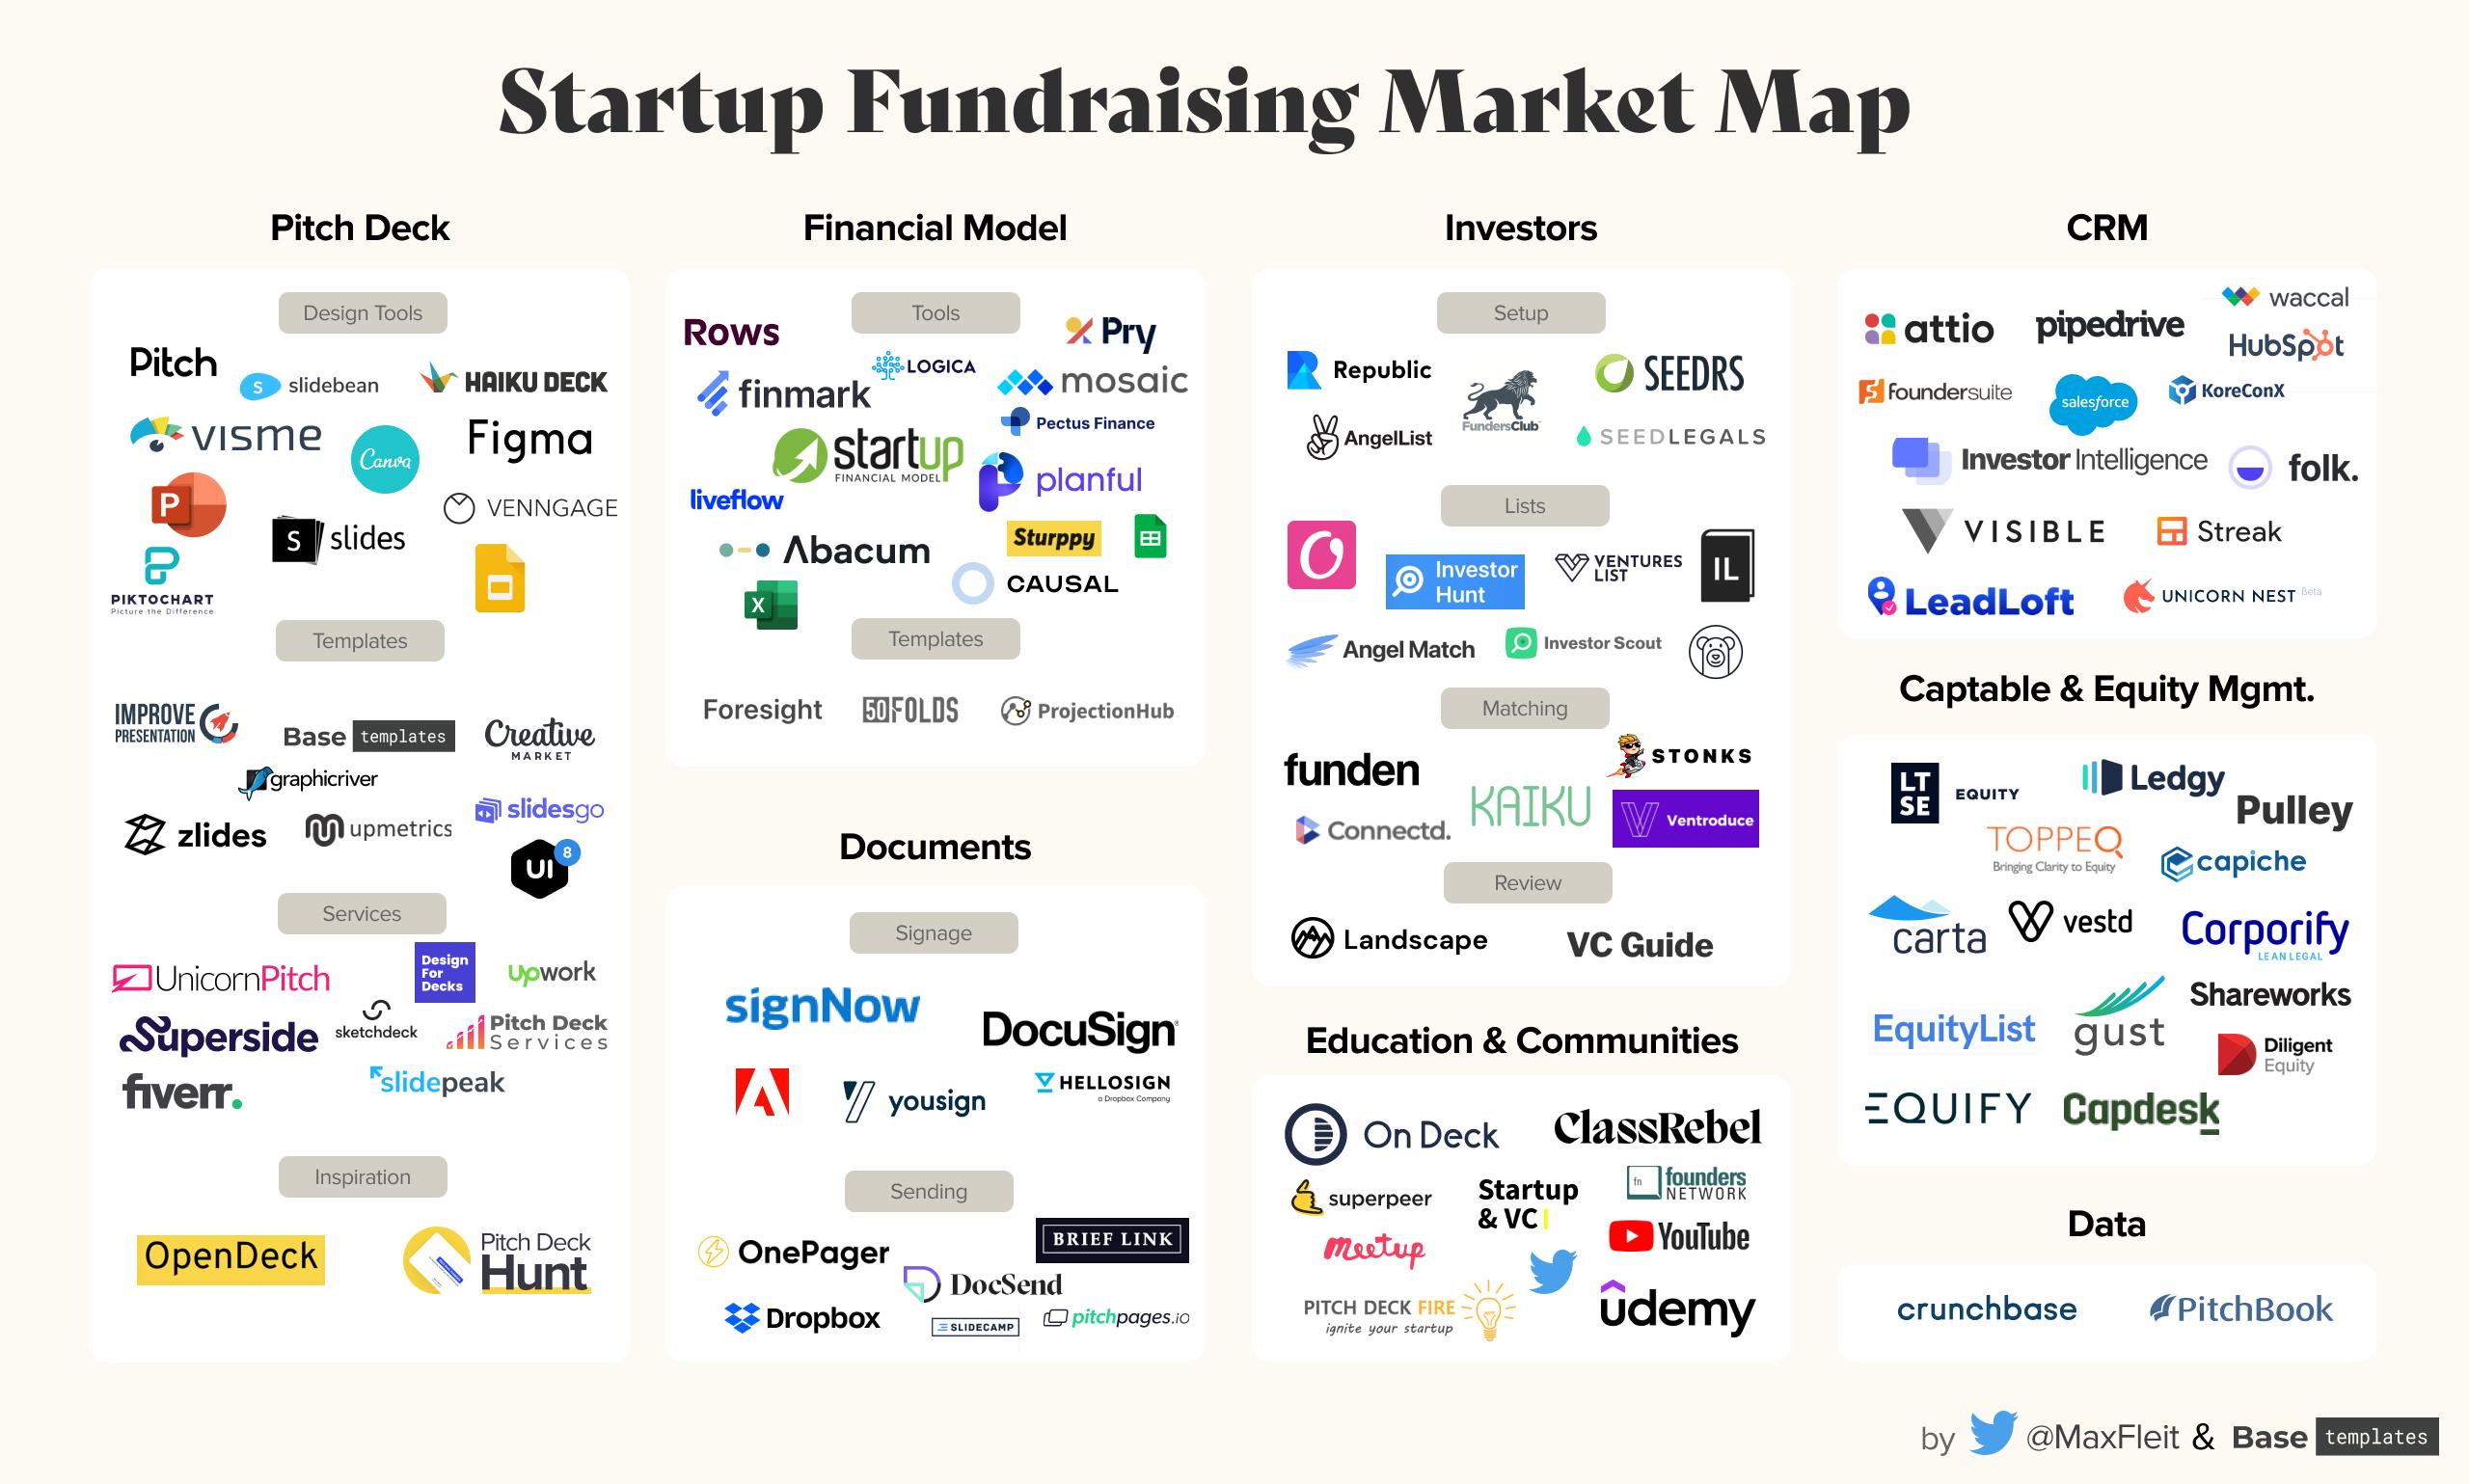 Startup Fundraising Tools 2021 - Market Map